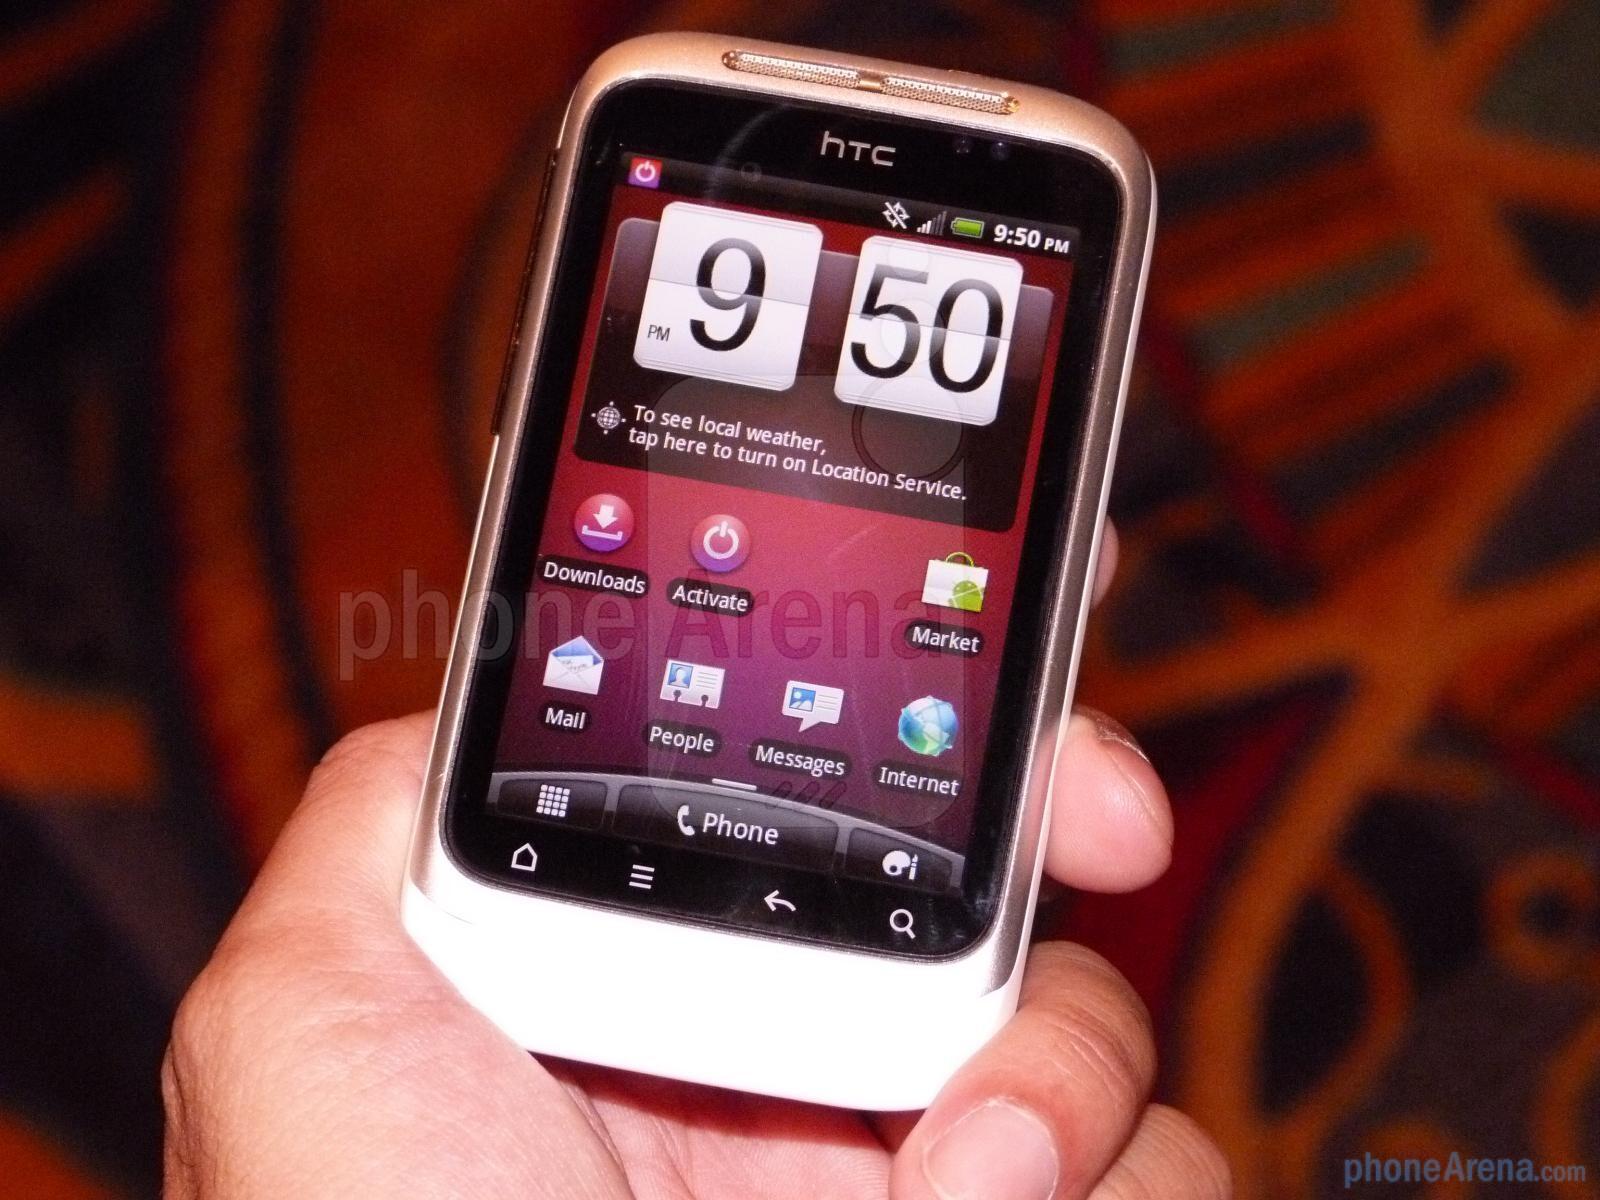 HTC Wildfire S CDMA Video clips - PhoneArena